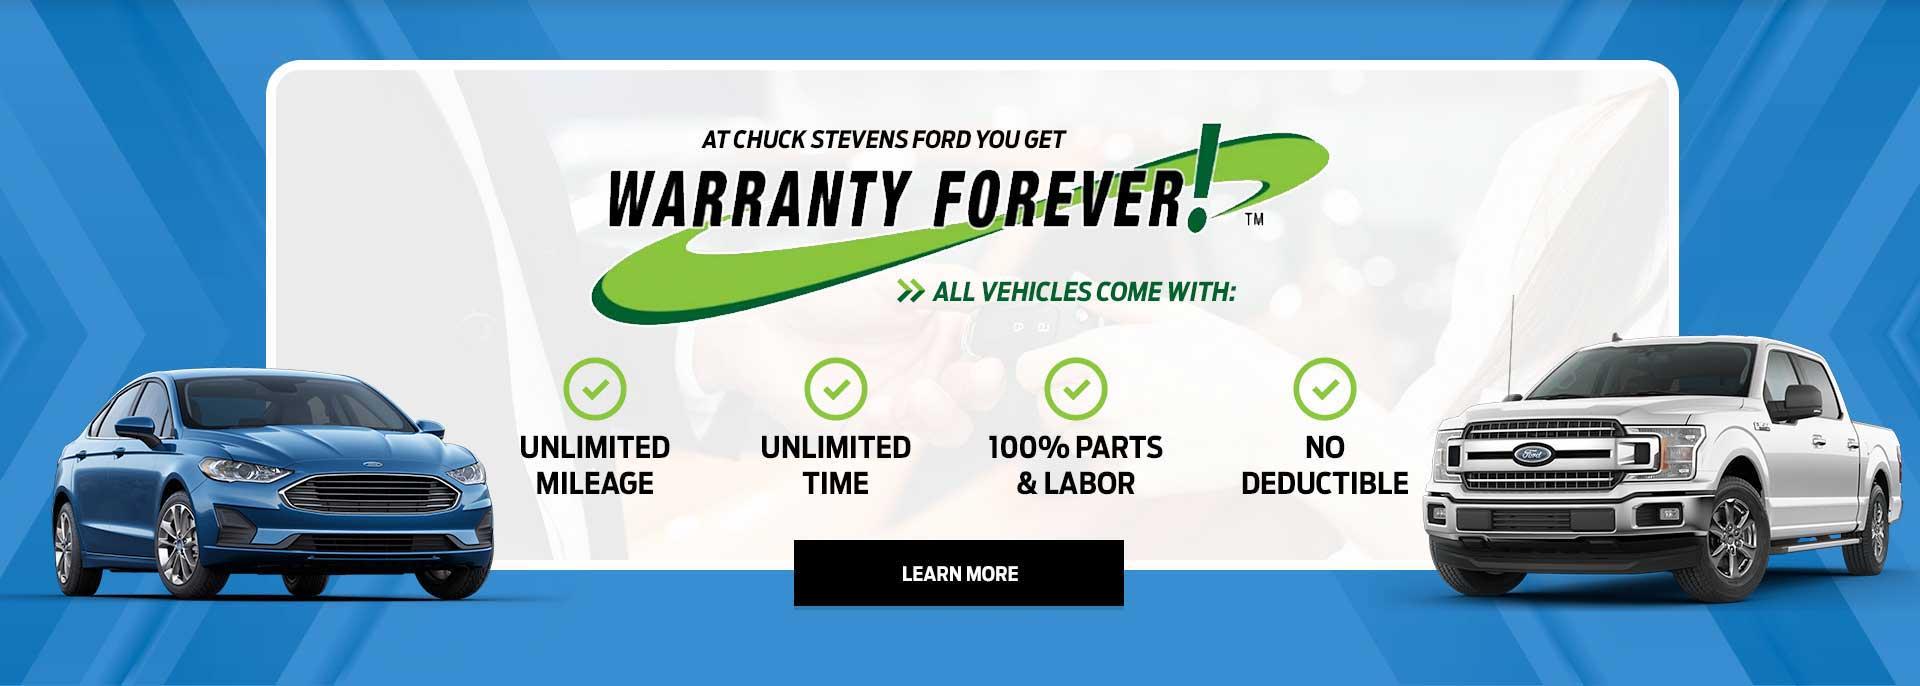 Banner Warranty Forever